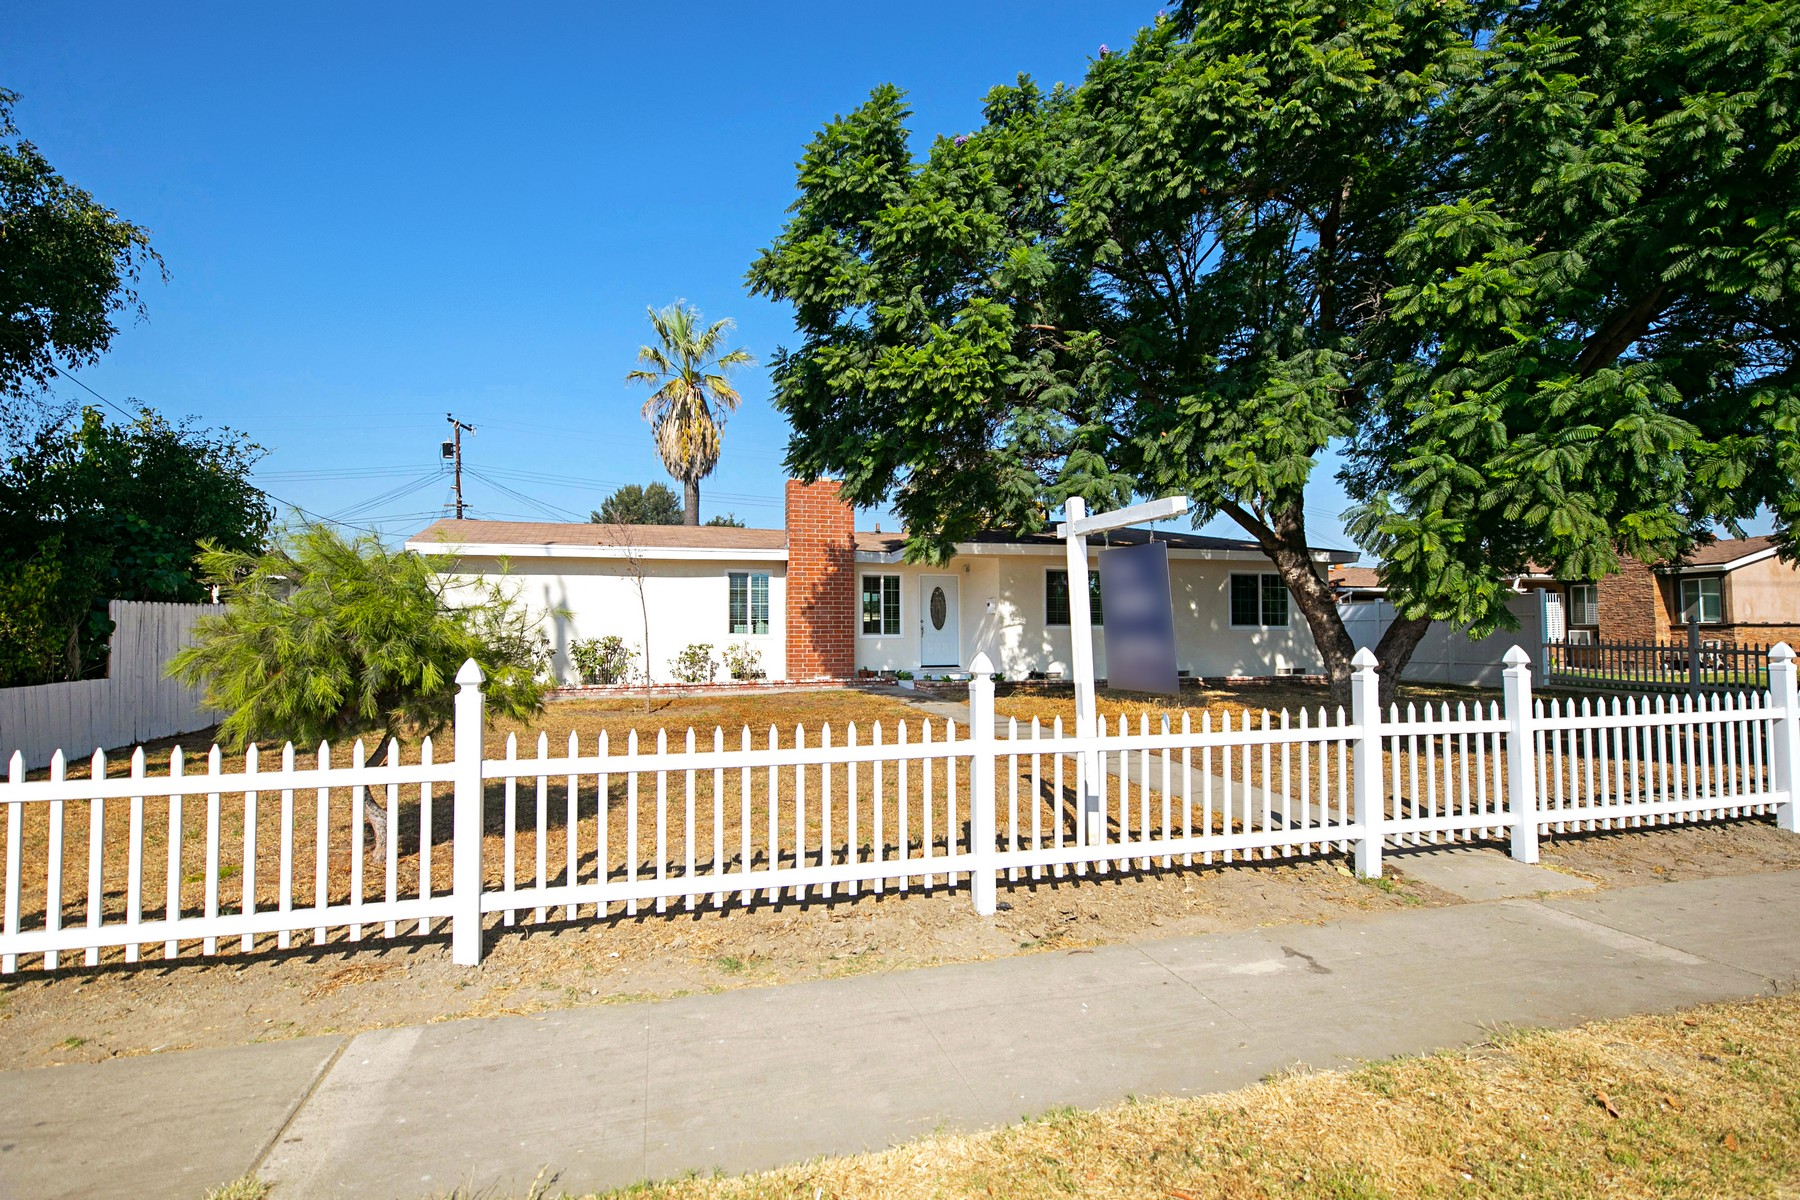 Single Family Homes for Sale at 2665 Cerritos Avenue 2665 W Cerritos Avenue Anaheim, California 92804 United States